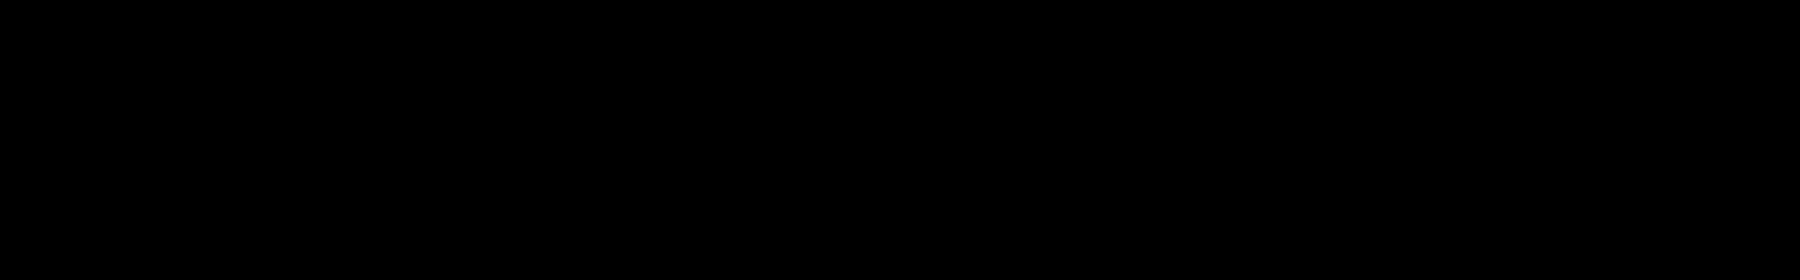 Psy Trance Journey Songstarter audio waveform